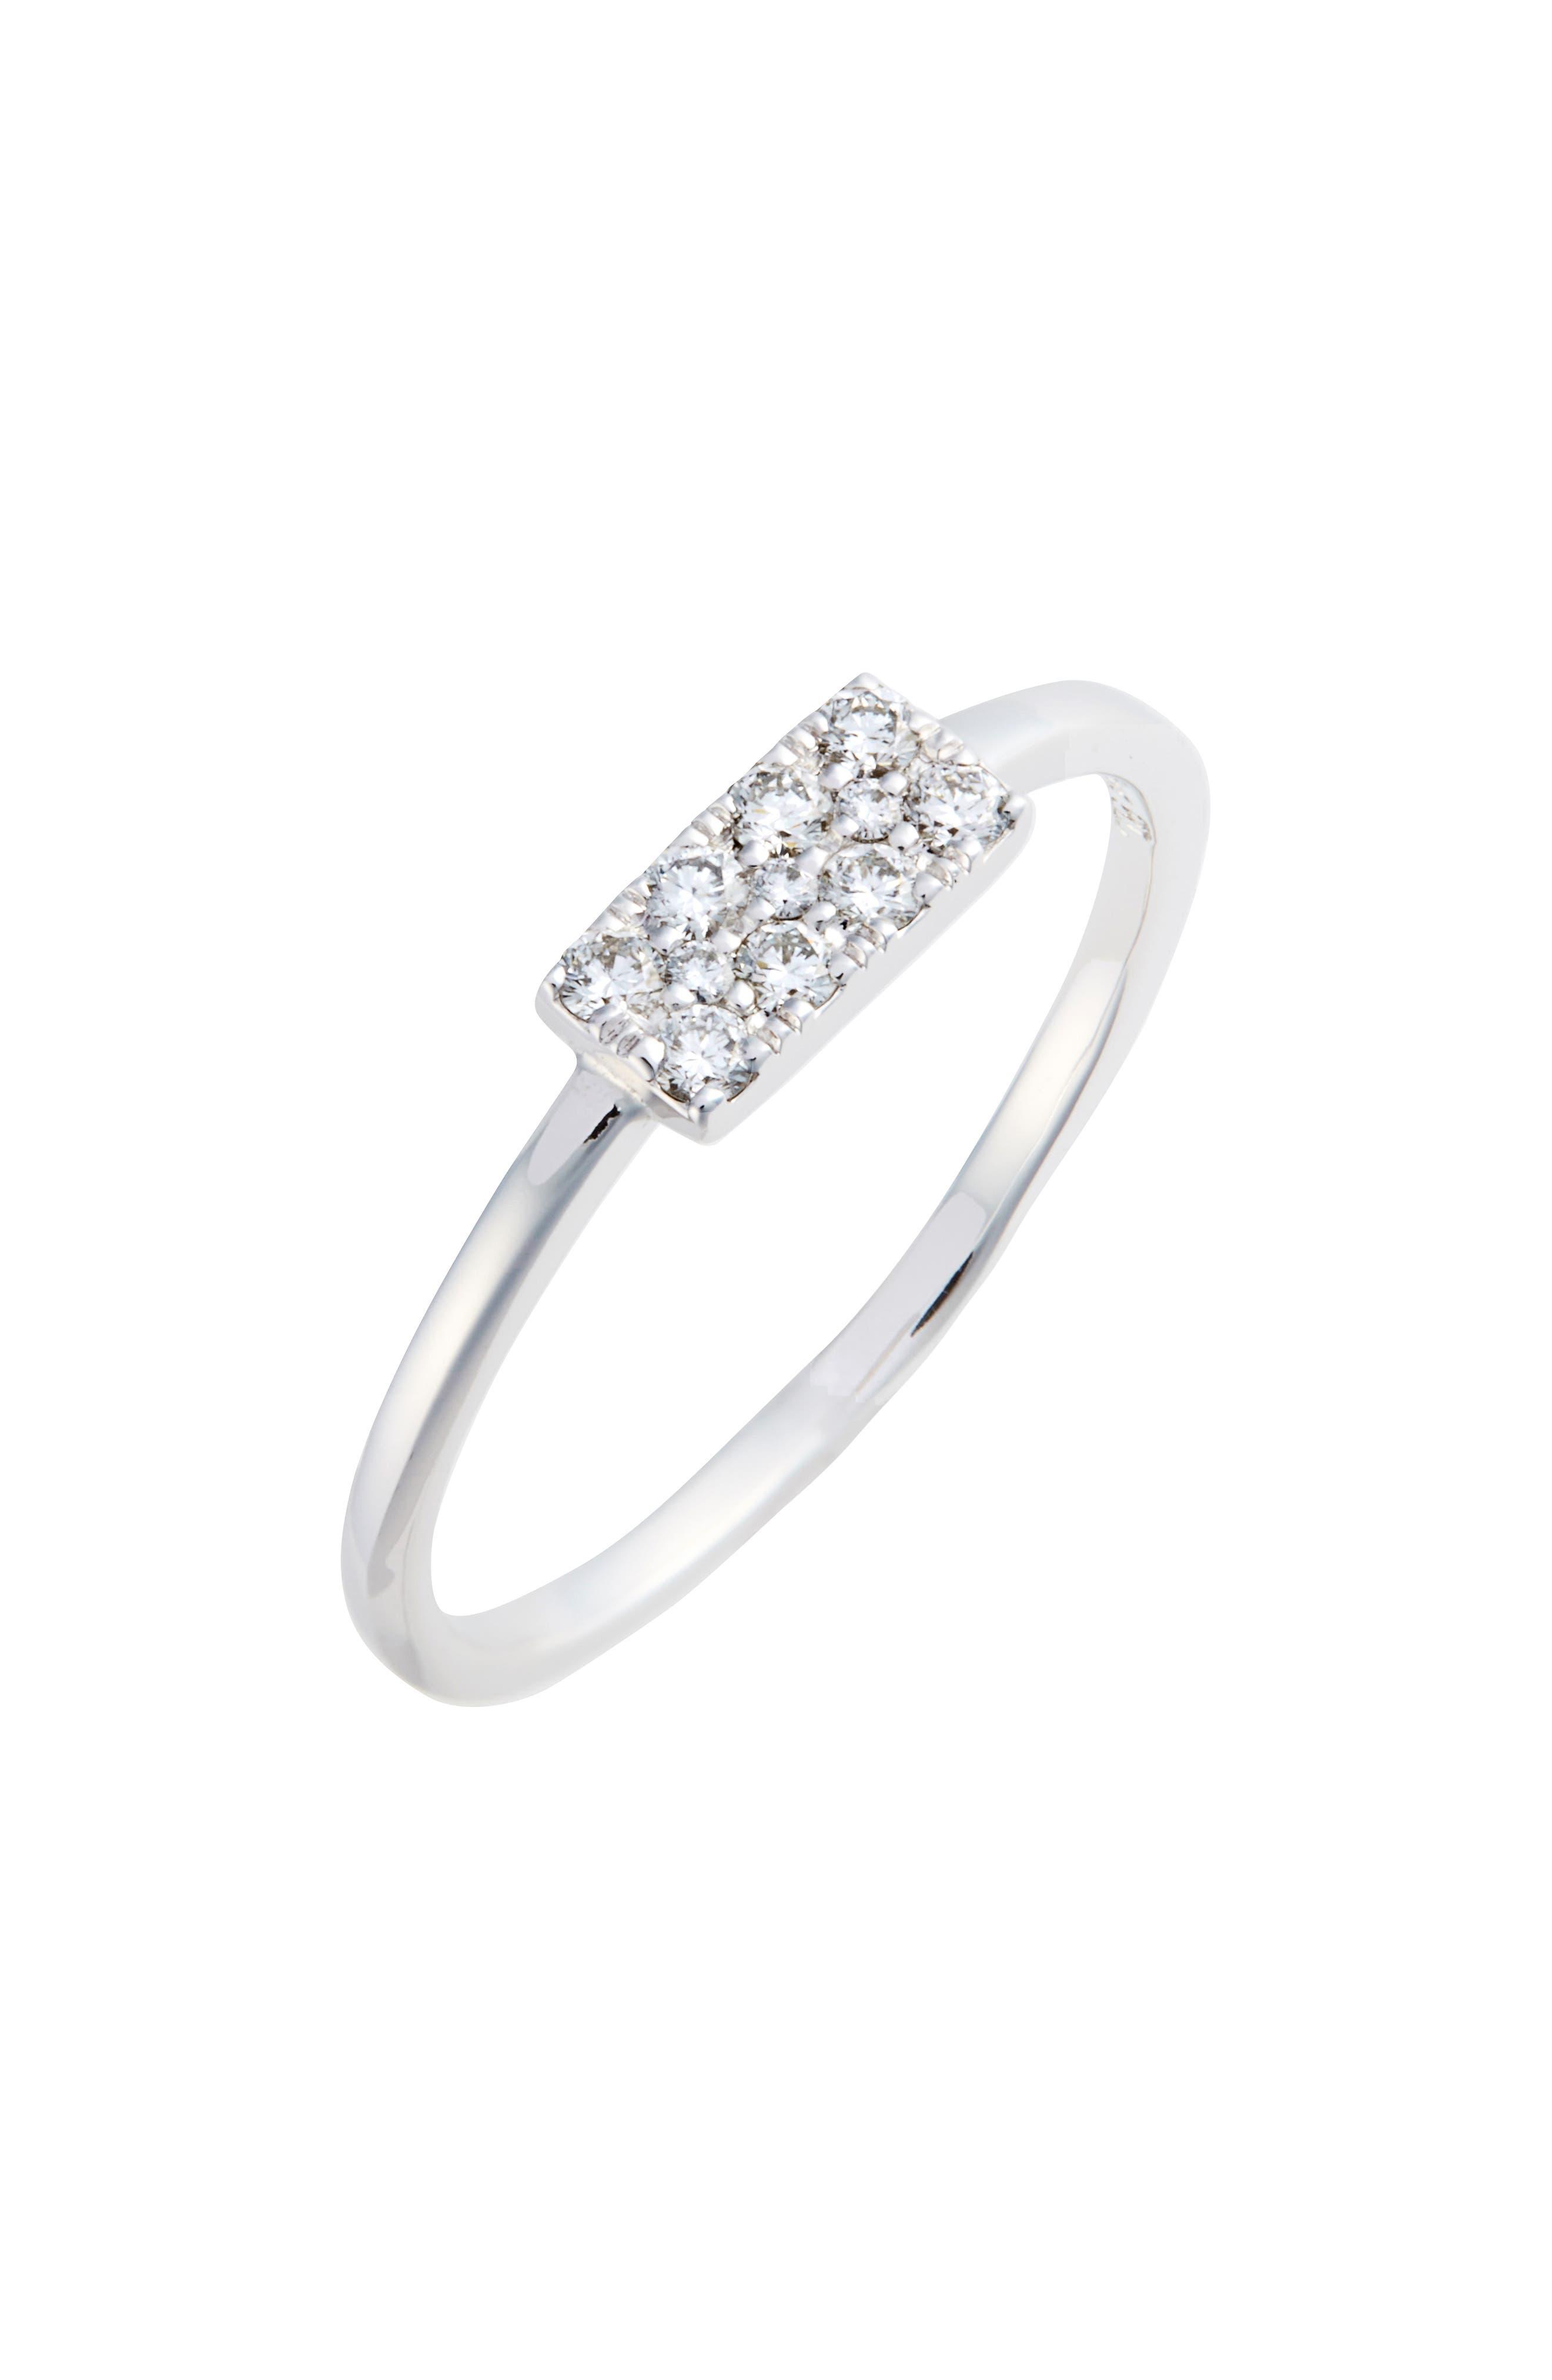 Diamond Rectangle Stacking Ring,                         Main,                         color, WHITE GOLD/ DIAMOND